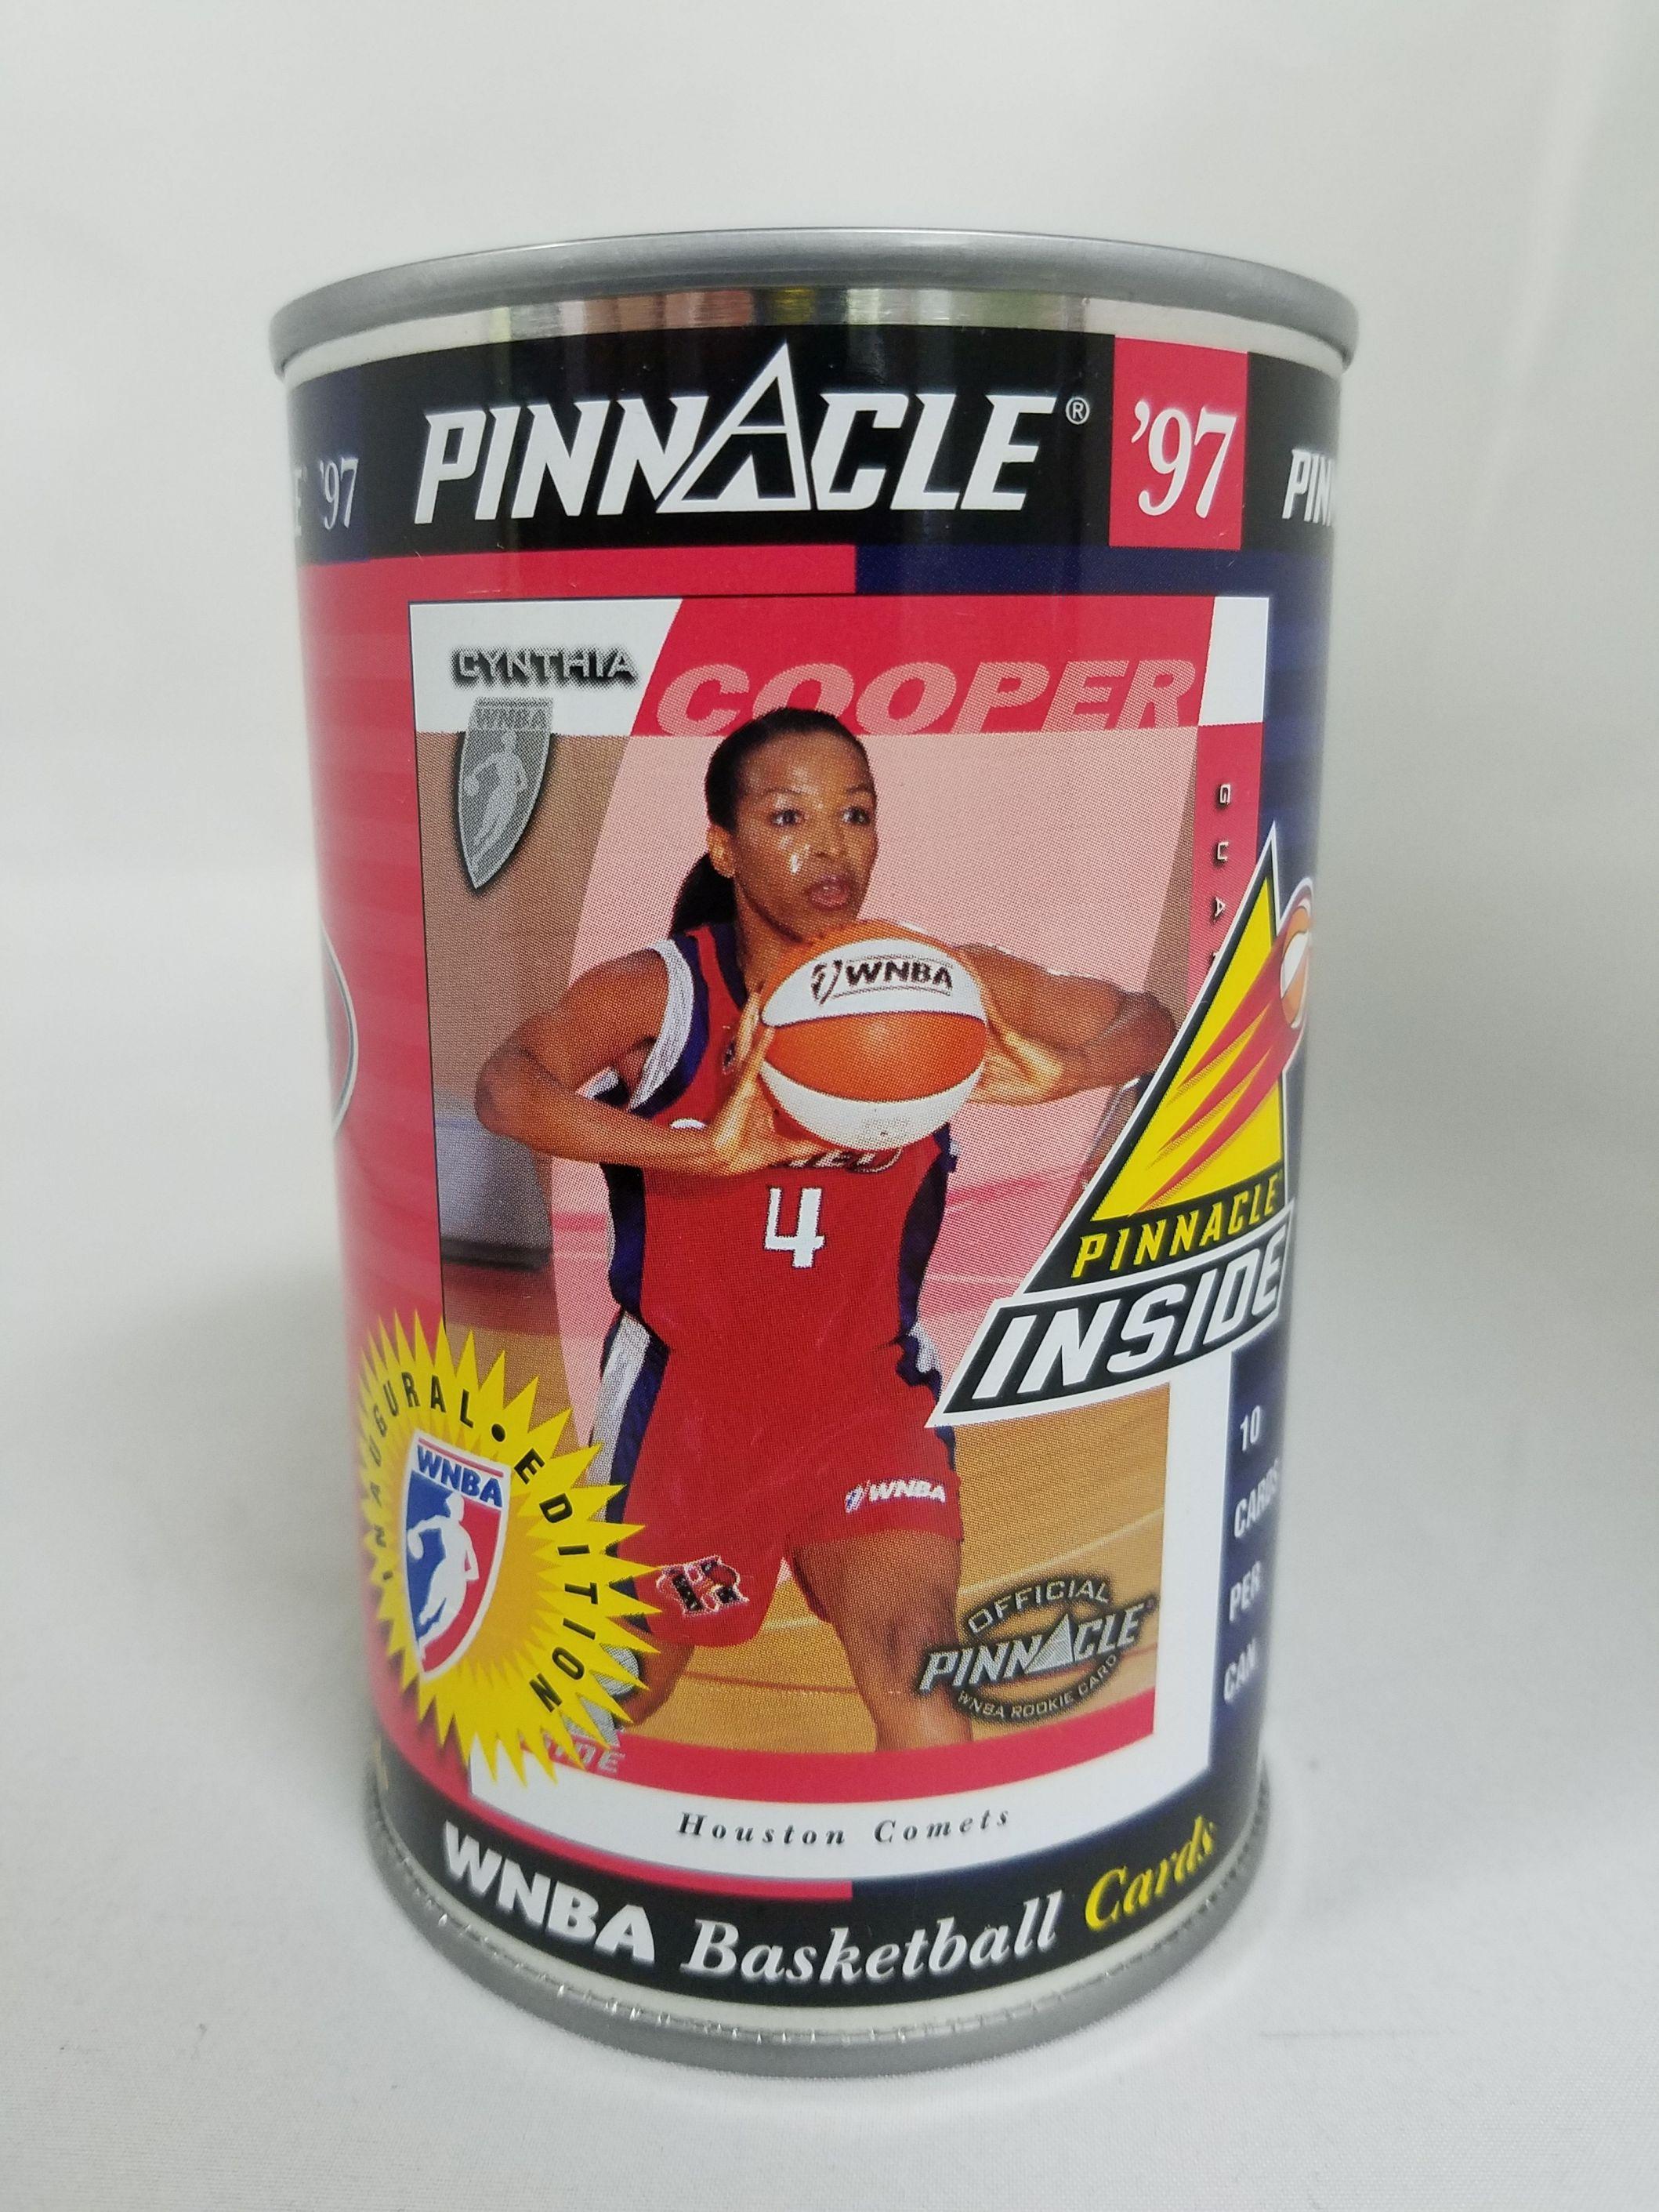 1997 Pinnacle Inside WNBA Cans #5 Cynthia Cooper